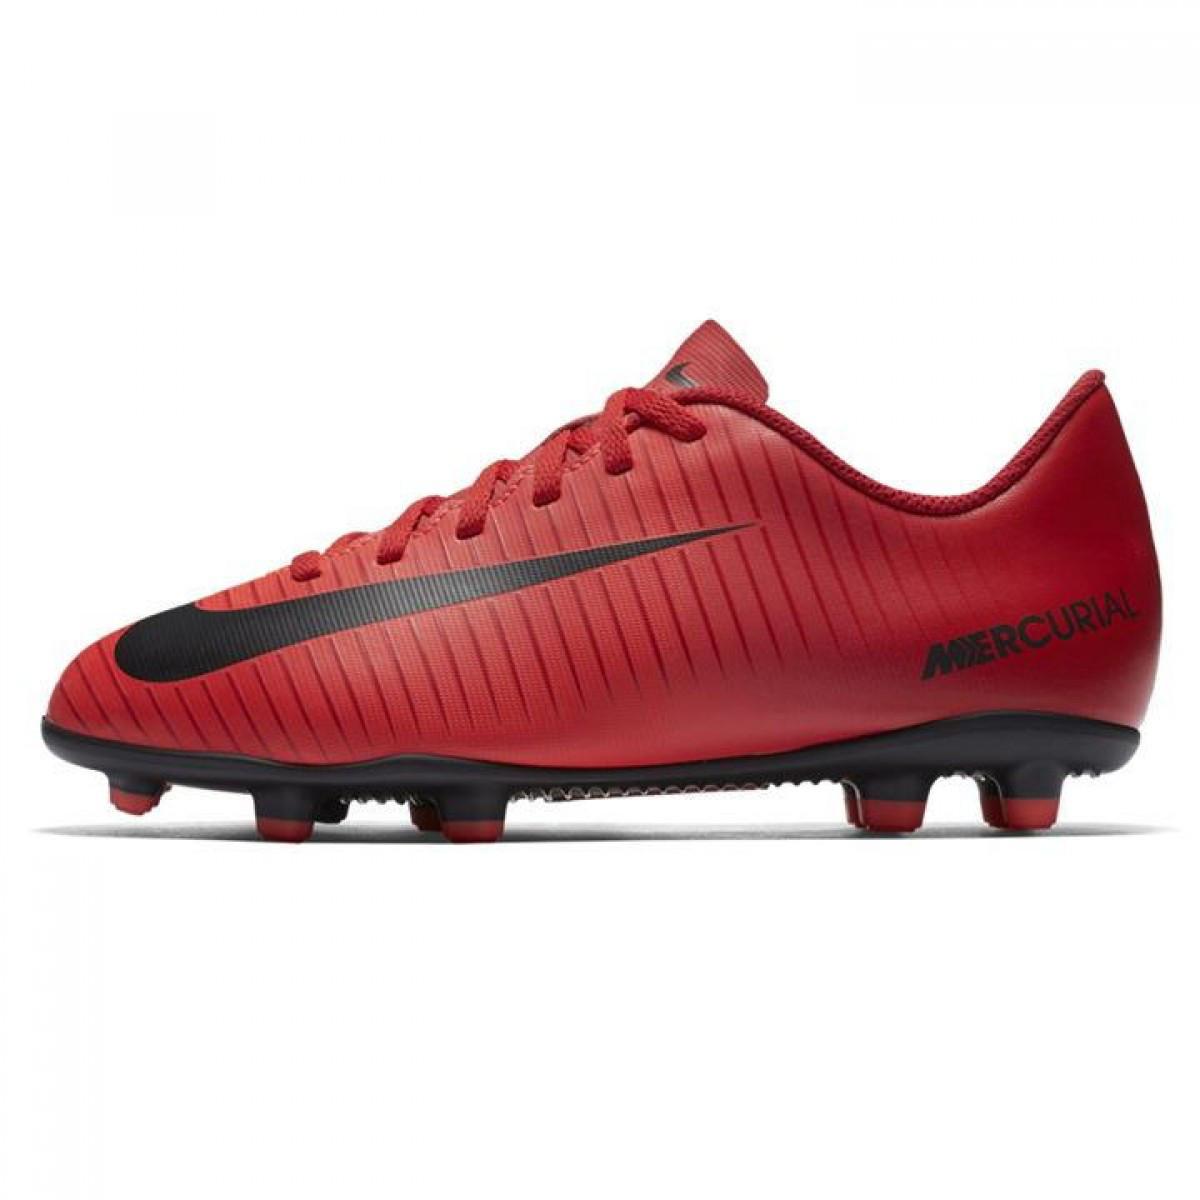 Купить фирменные Бутсы Nike Mercurial Vortex Childrens FG Red Black ... 0e050af821359